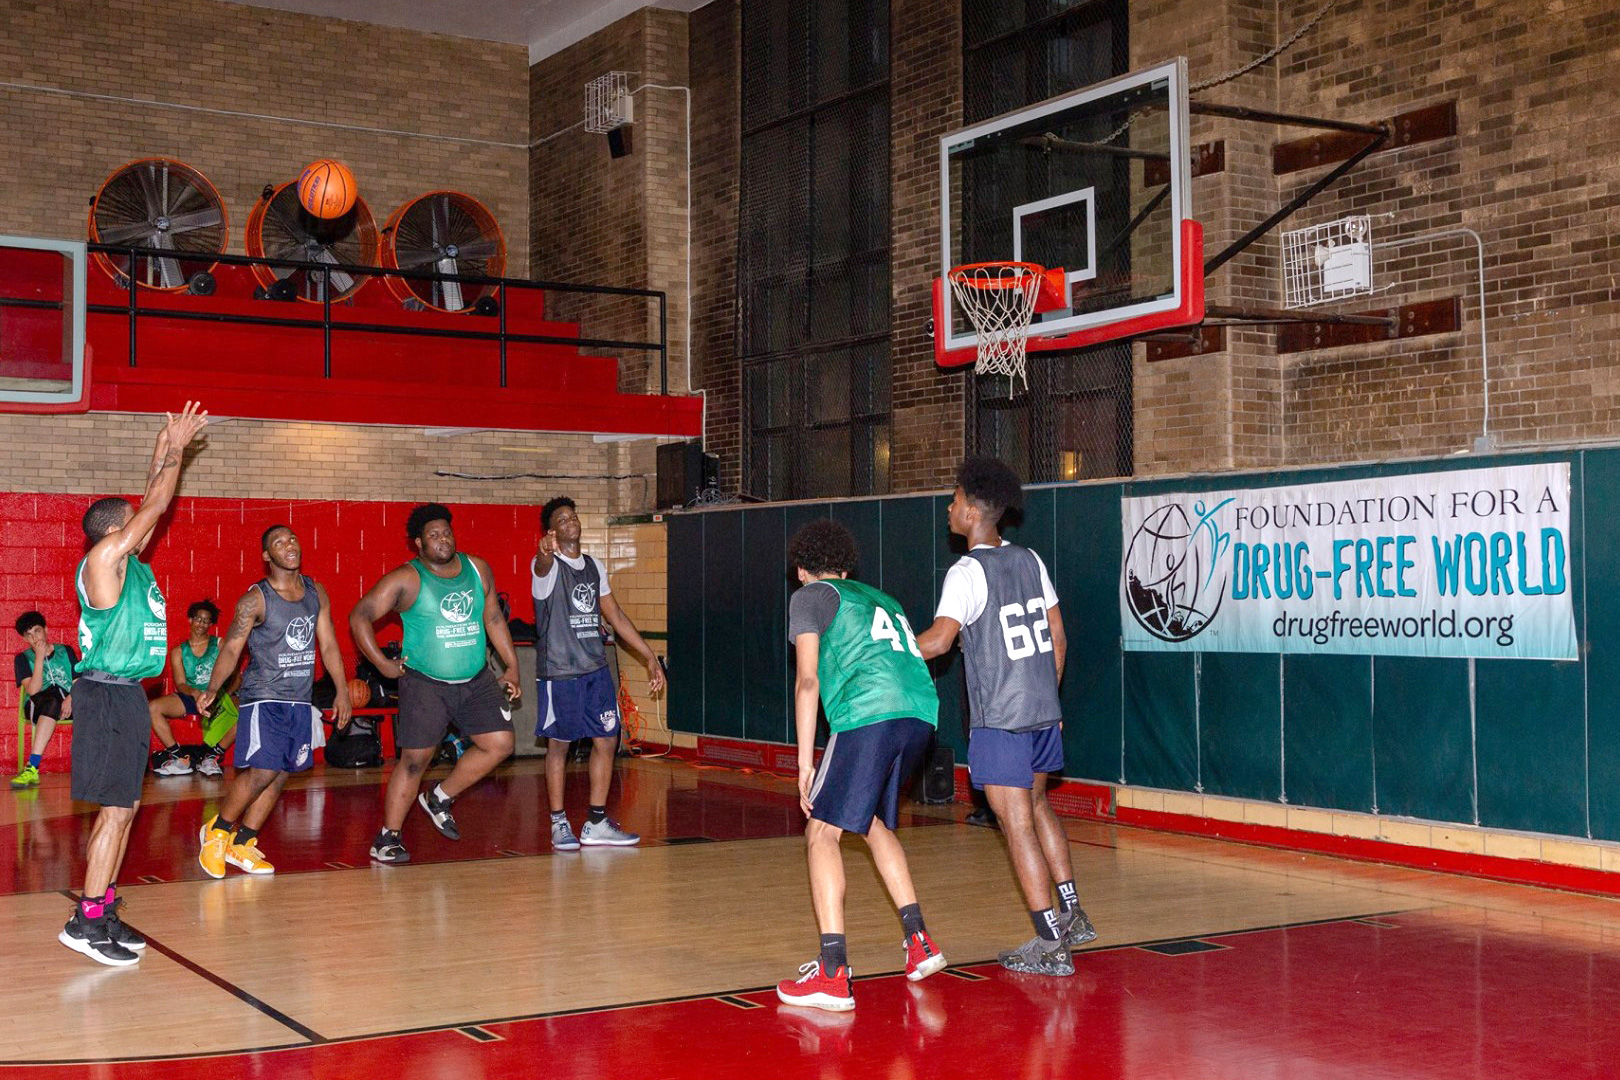 2nd-Annual-Drug-Free-Basketball-Tournament-10.jpg